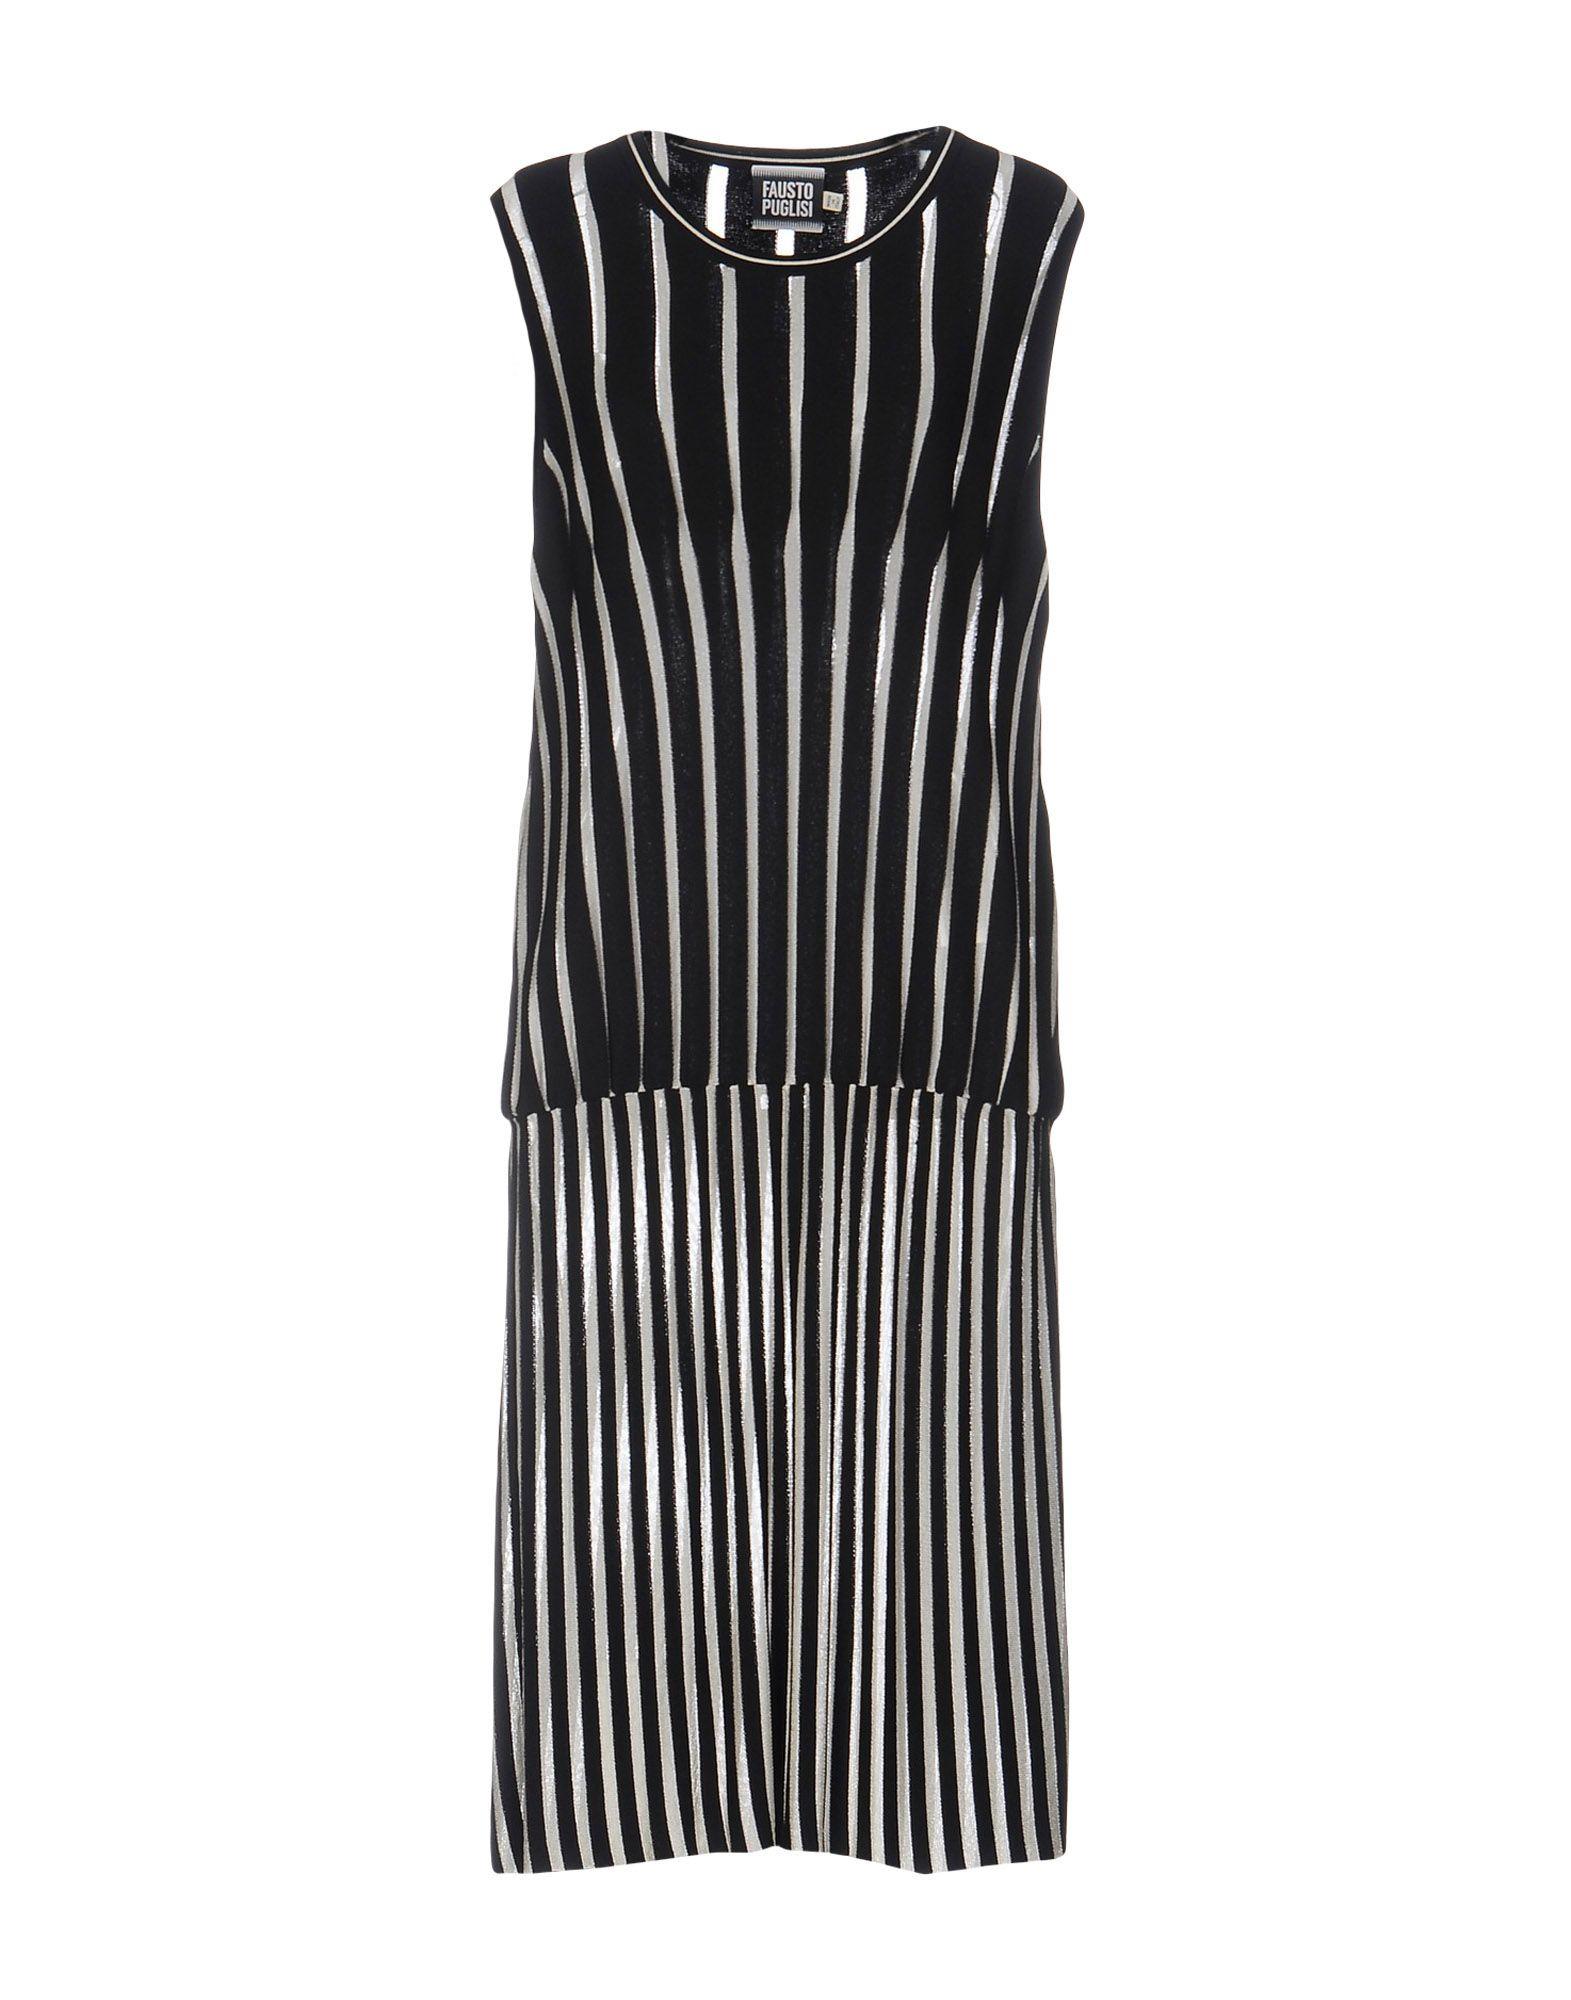 fausto puglisi g16020479007 FAUSTO PUGLISI Платье до колена